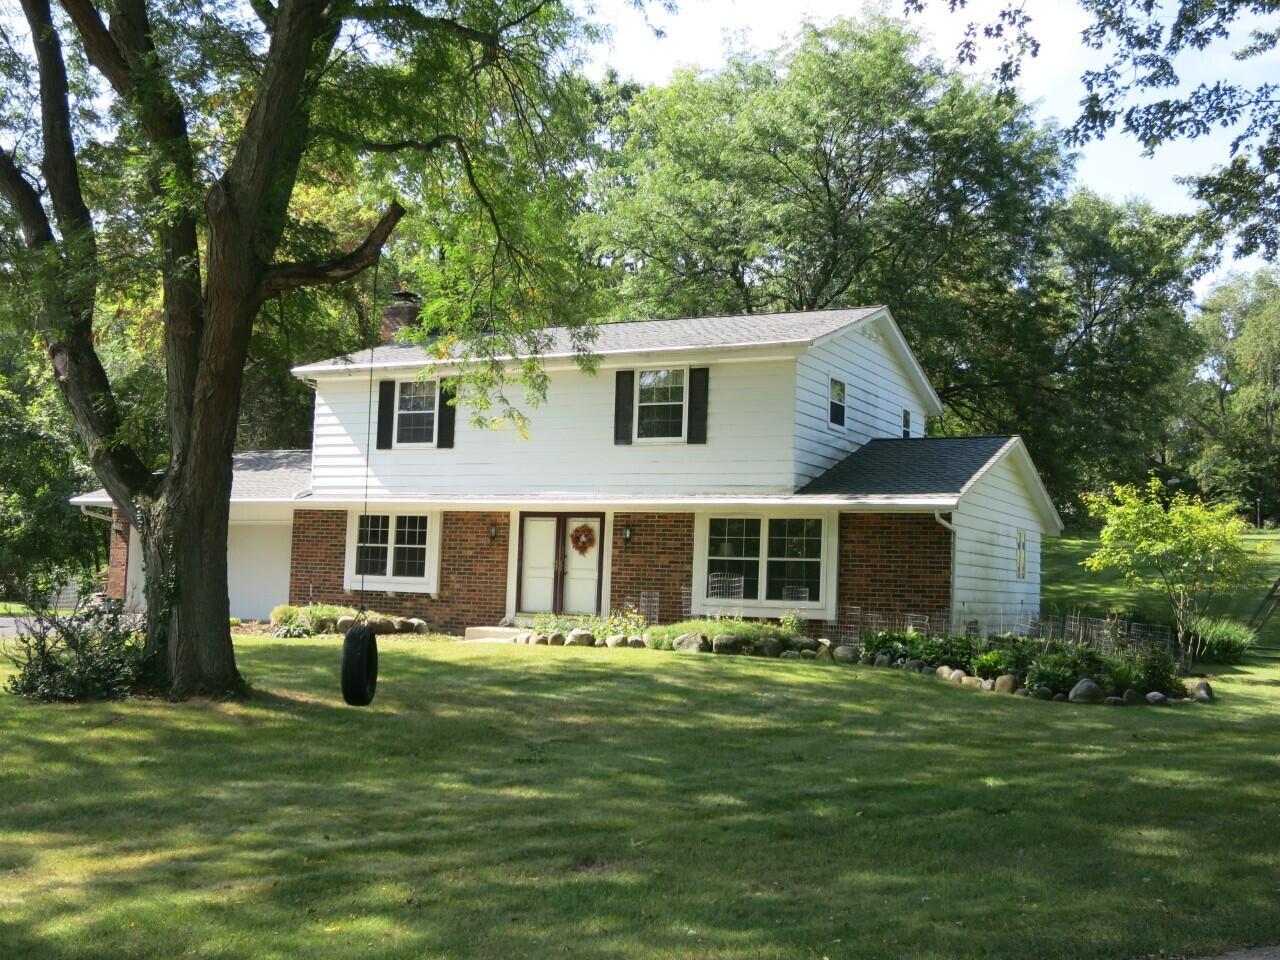 W318N715 Partridge Run, Delafield, Wisconsin 53018, 4 Bedrooms Bedrooms, 7 Rooms Rooms,2 BathroomsBathrooms,Single-Family,For Sale,Partridge Run,1765198